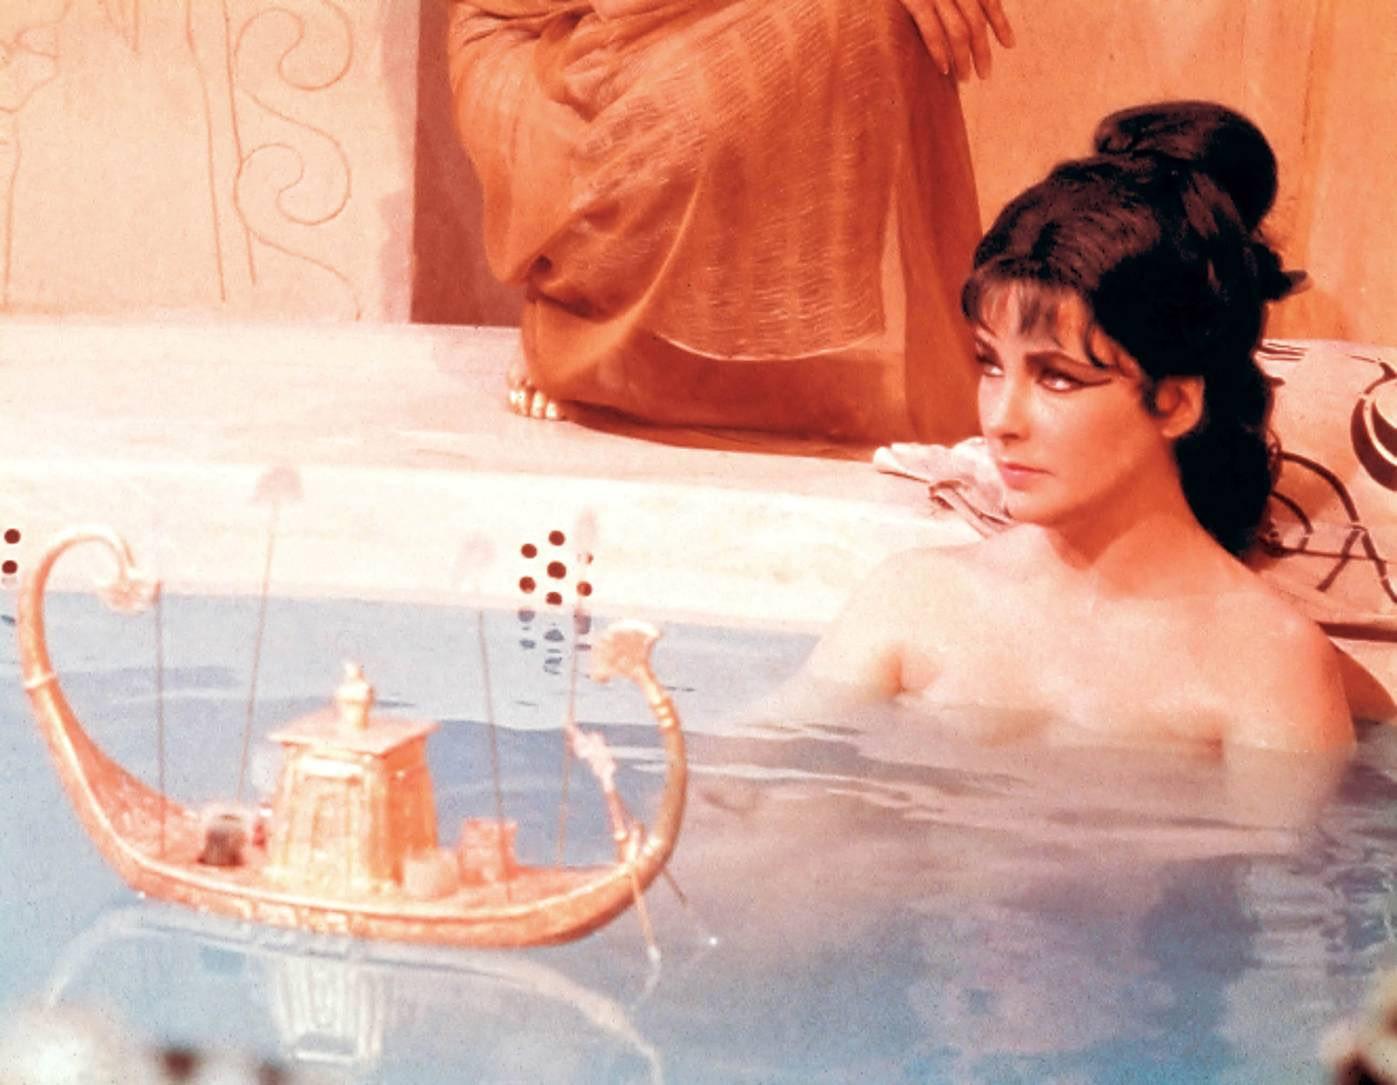 http://1.bp.blogspot.com/-9vdzgoYgKYo/TYvjGxZYDZI/AAAAAAAAAYE/66h2fgFTPUo/s1600/Cleopatra-1963-elizabeth-taylor-%2Bin%2Bthe%2Bbath.jpg